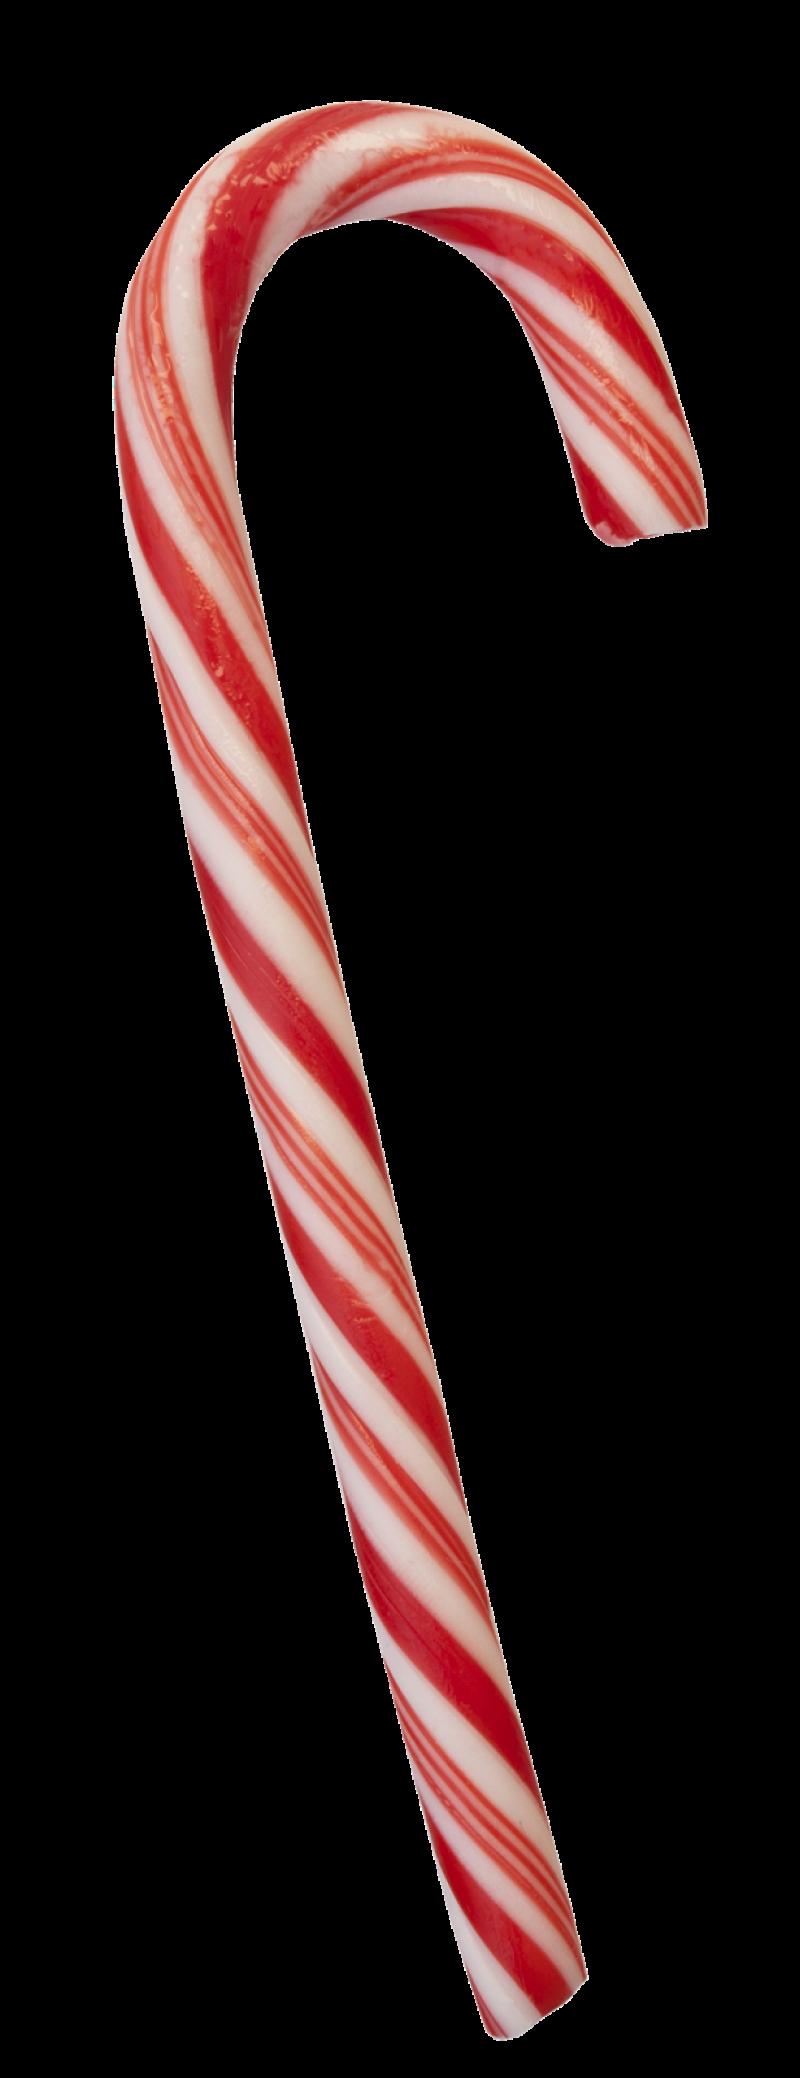 Sugar Cane Striped PNG Image